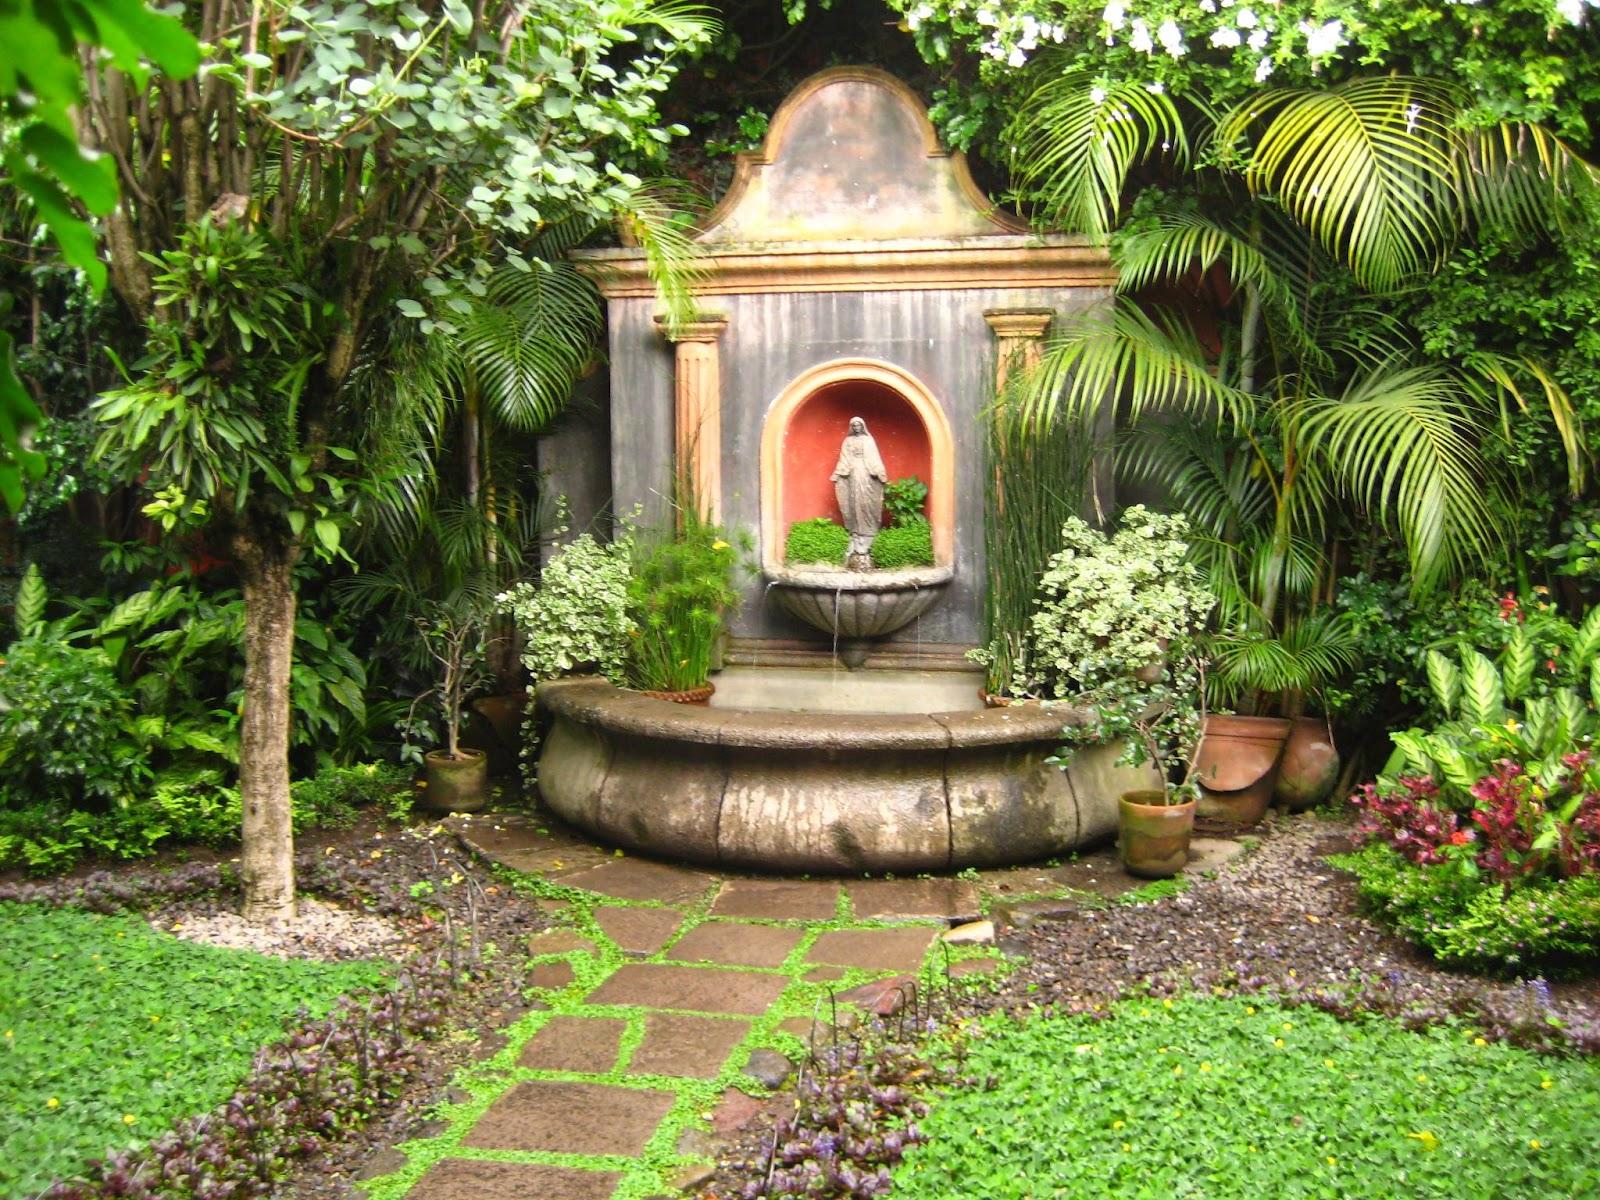 Xardinnova m s fuentes for Fuentes ornamentales jardin